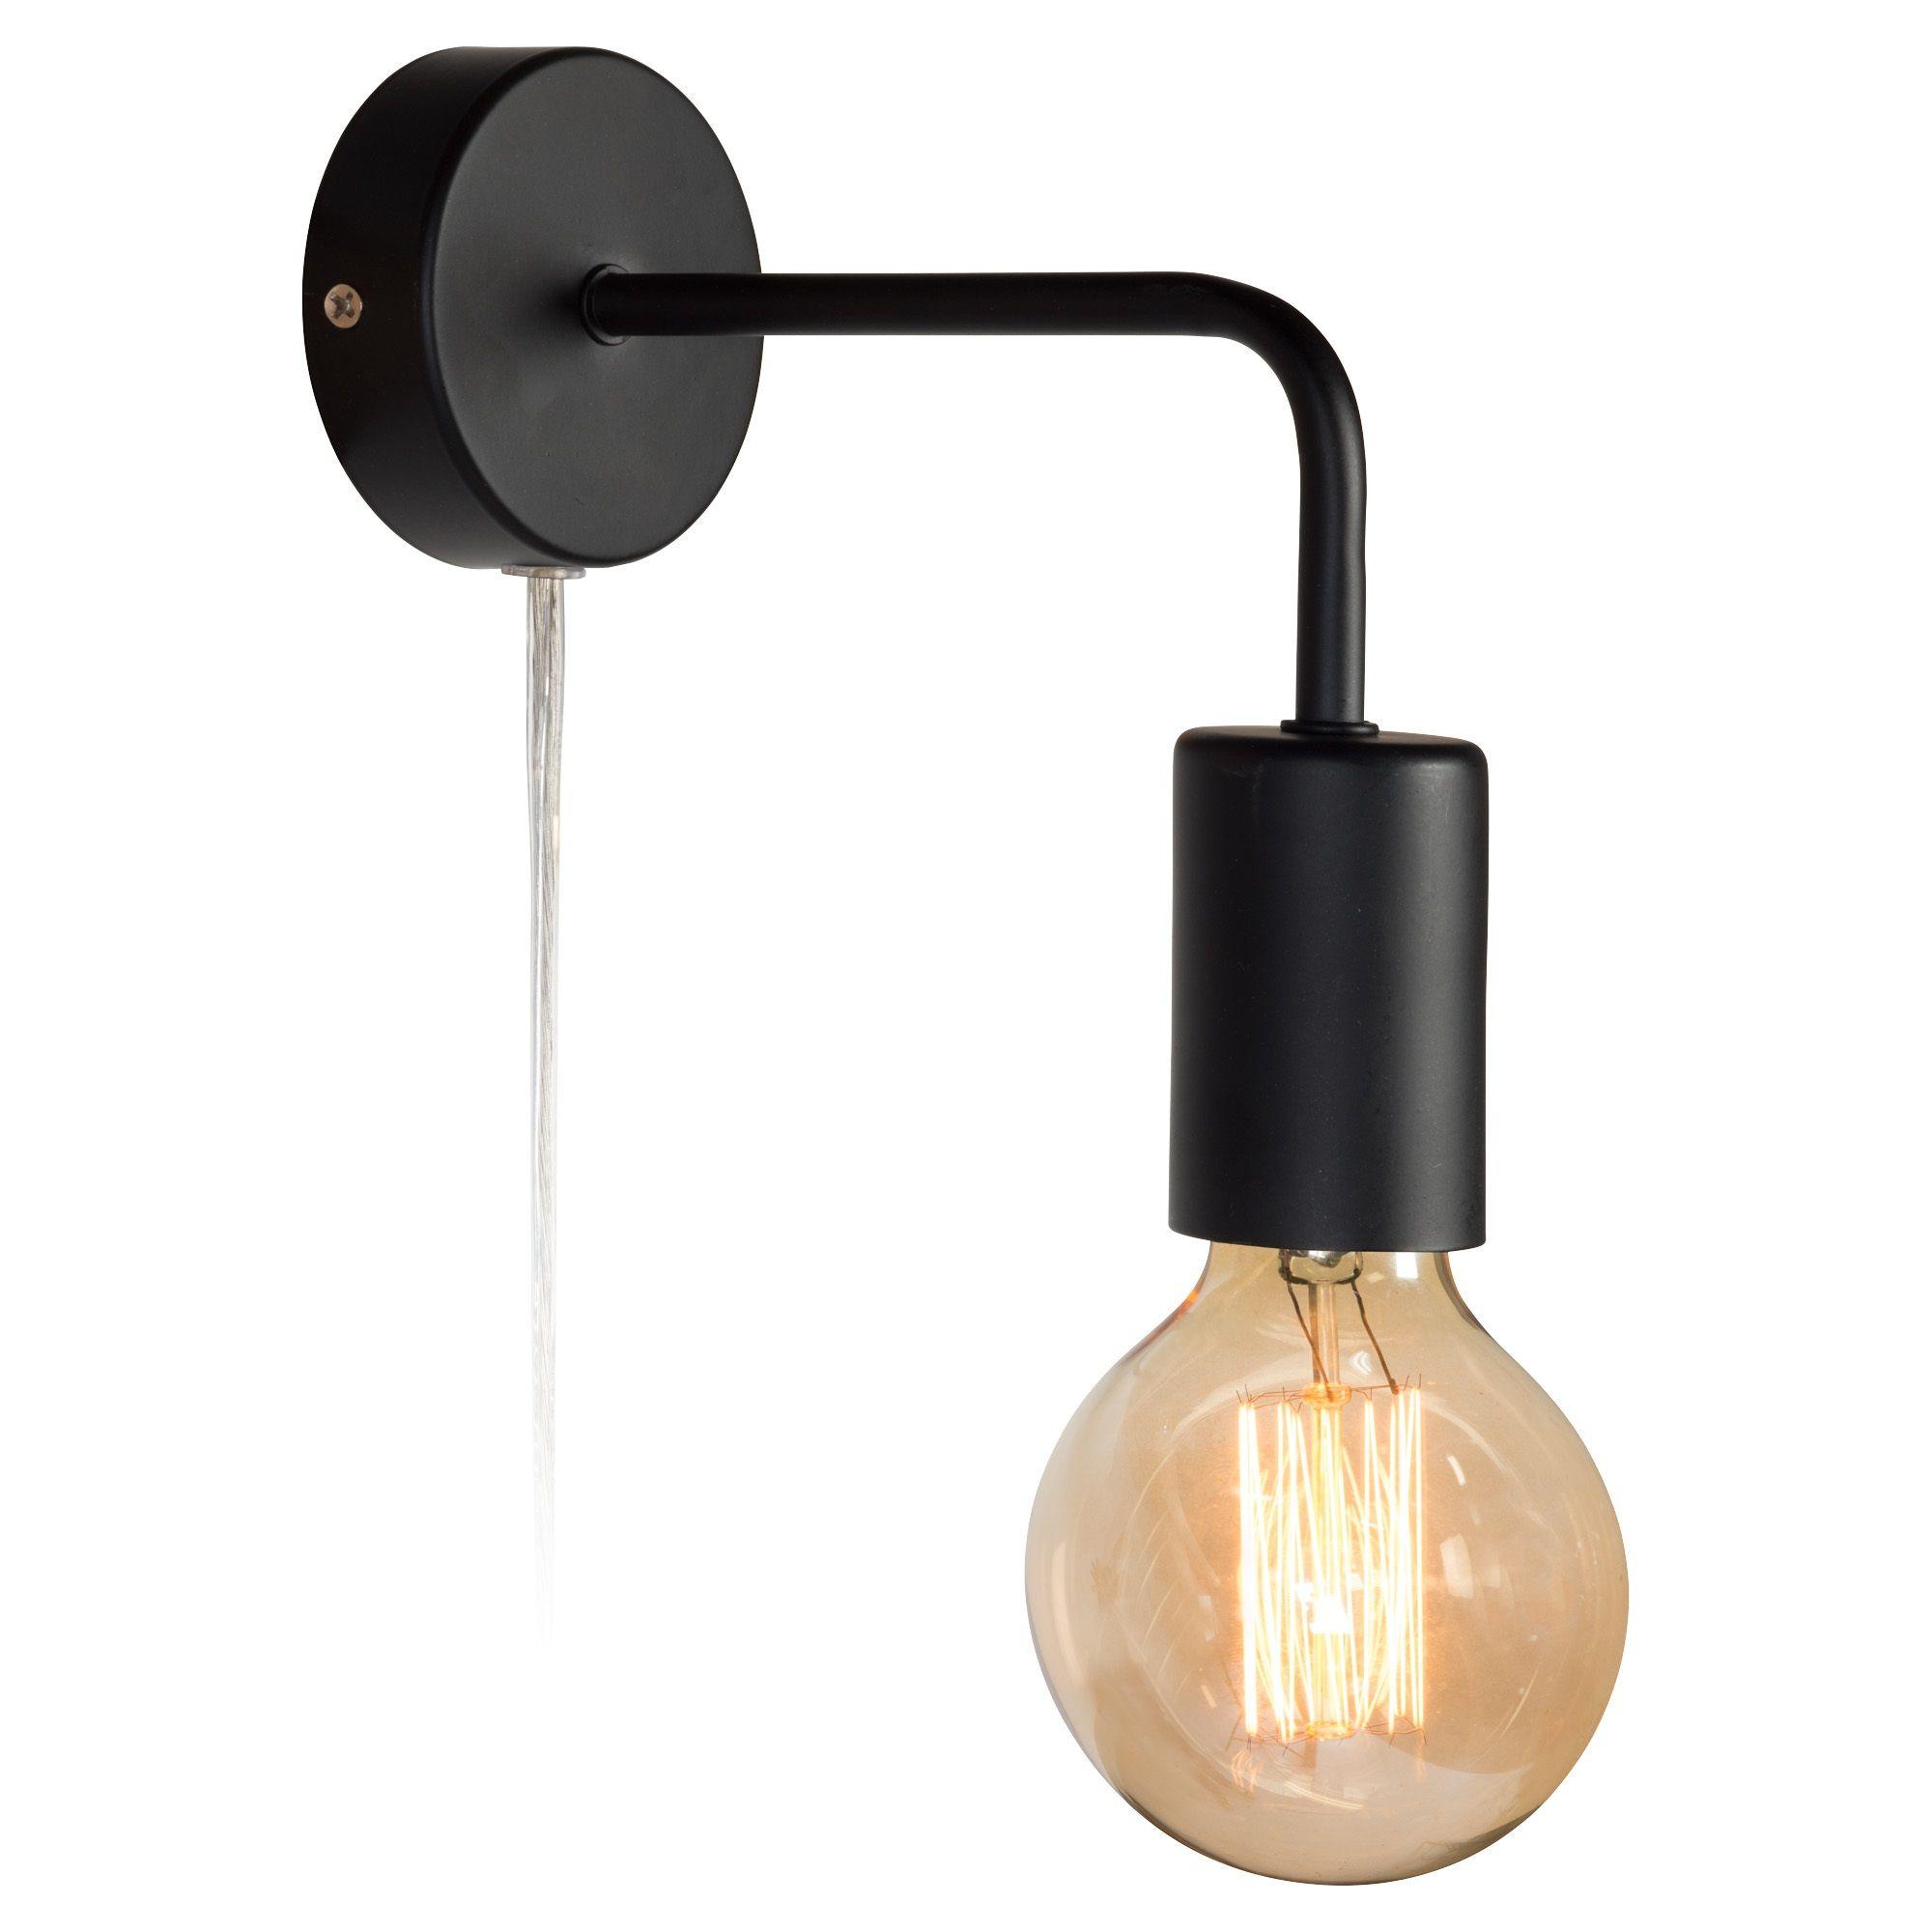 Wandlamp Balor Zwart Kwantum Wandlamp Slaapkamer Verlichting Badkamer Verlichting